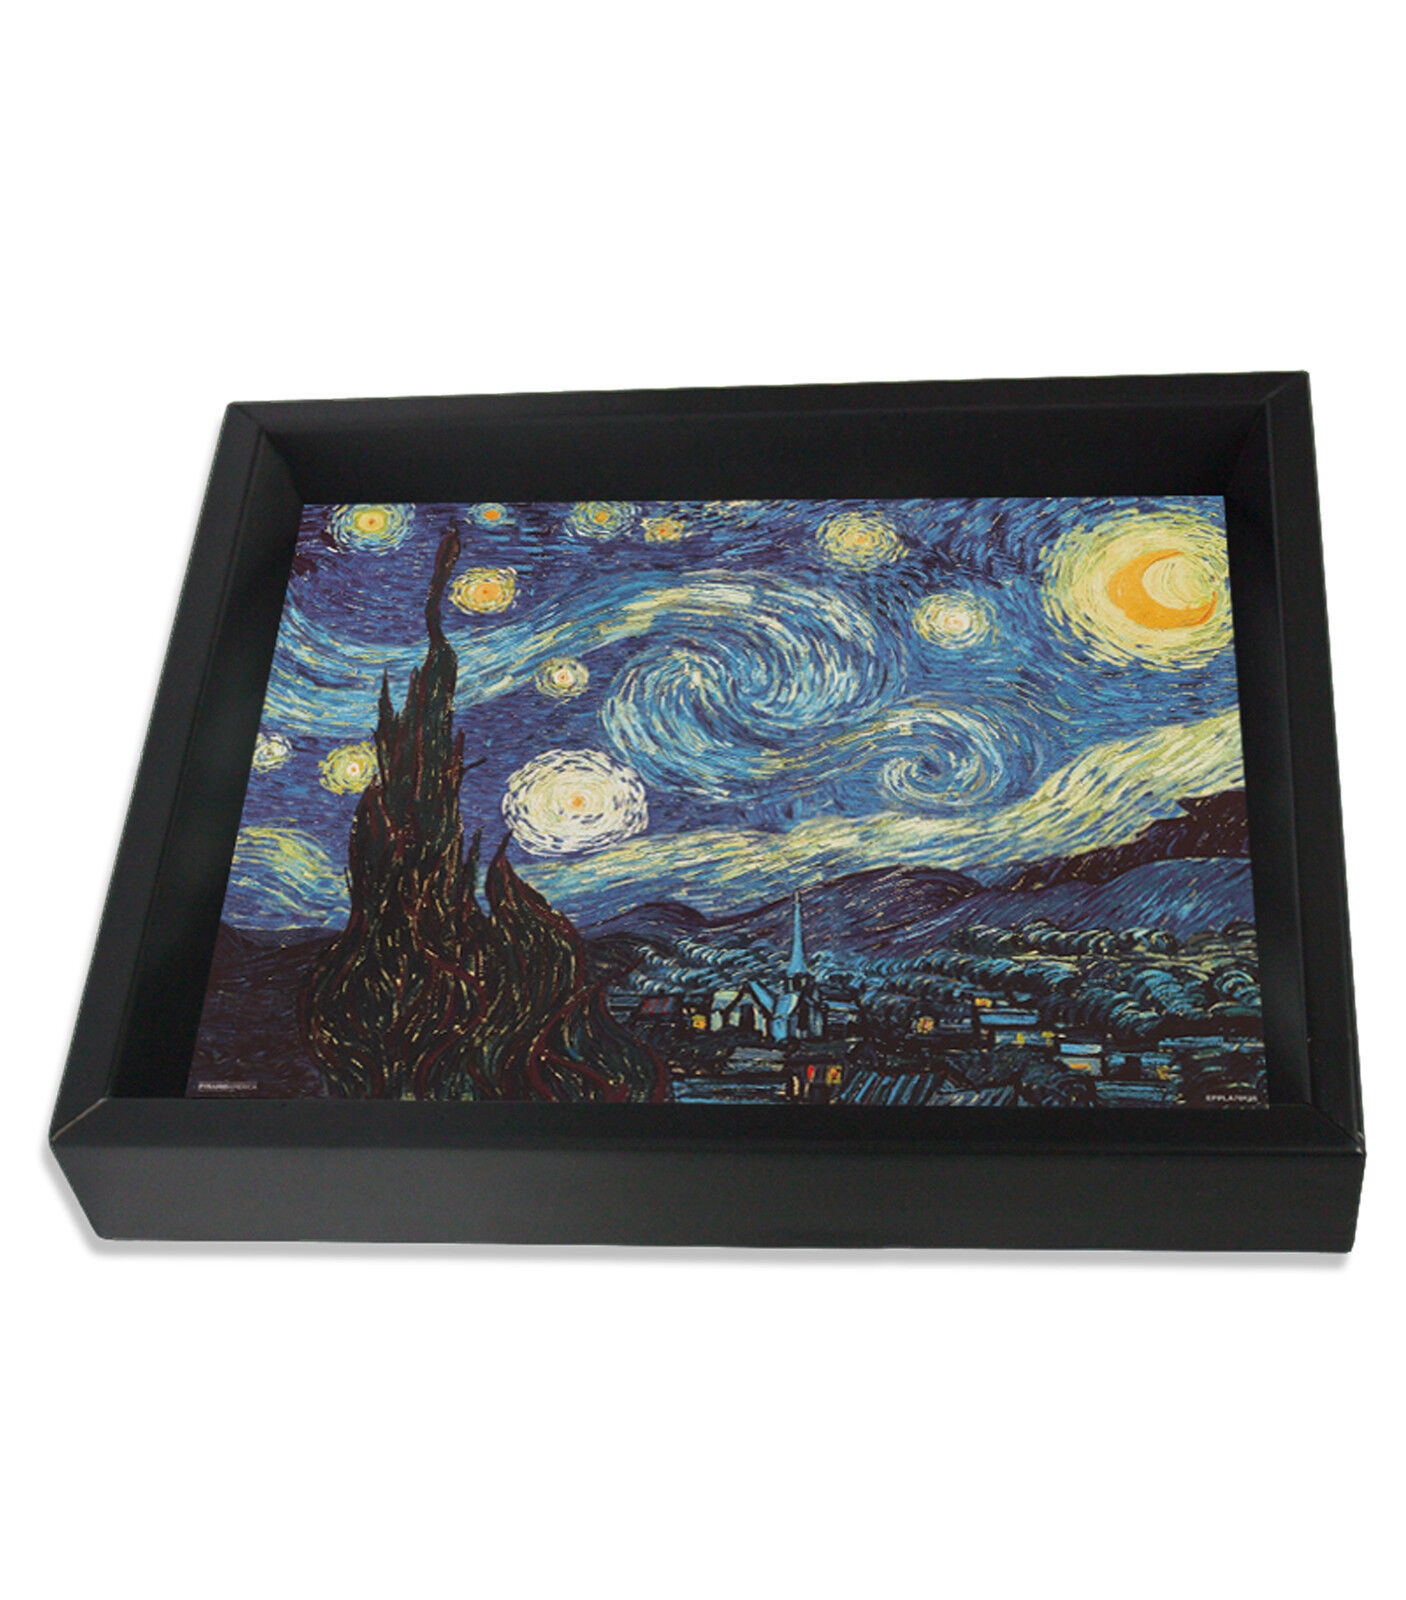 6597.Painting.Van Gogh/'s starry starry night.stars.village.POSTER.art wall decor